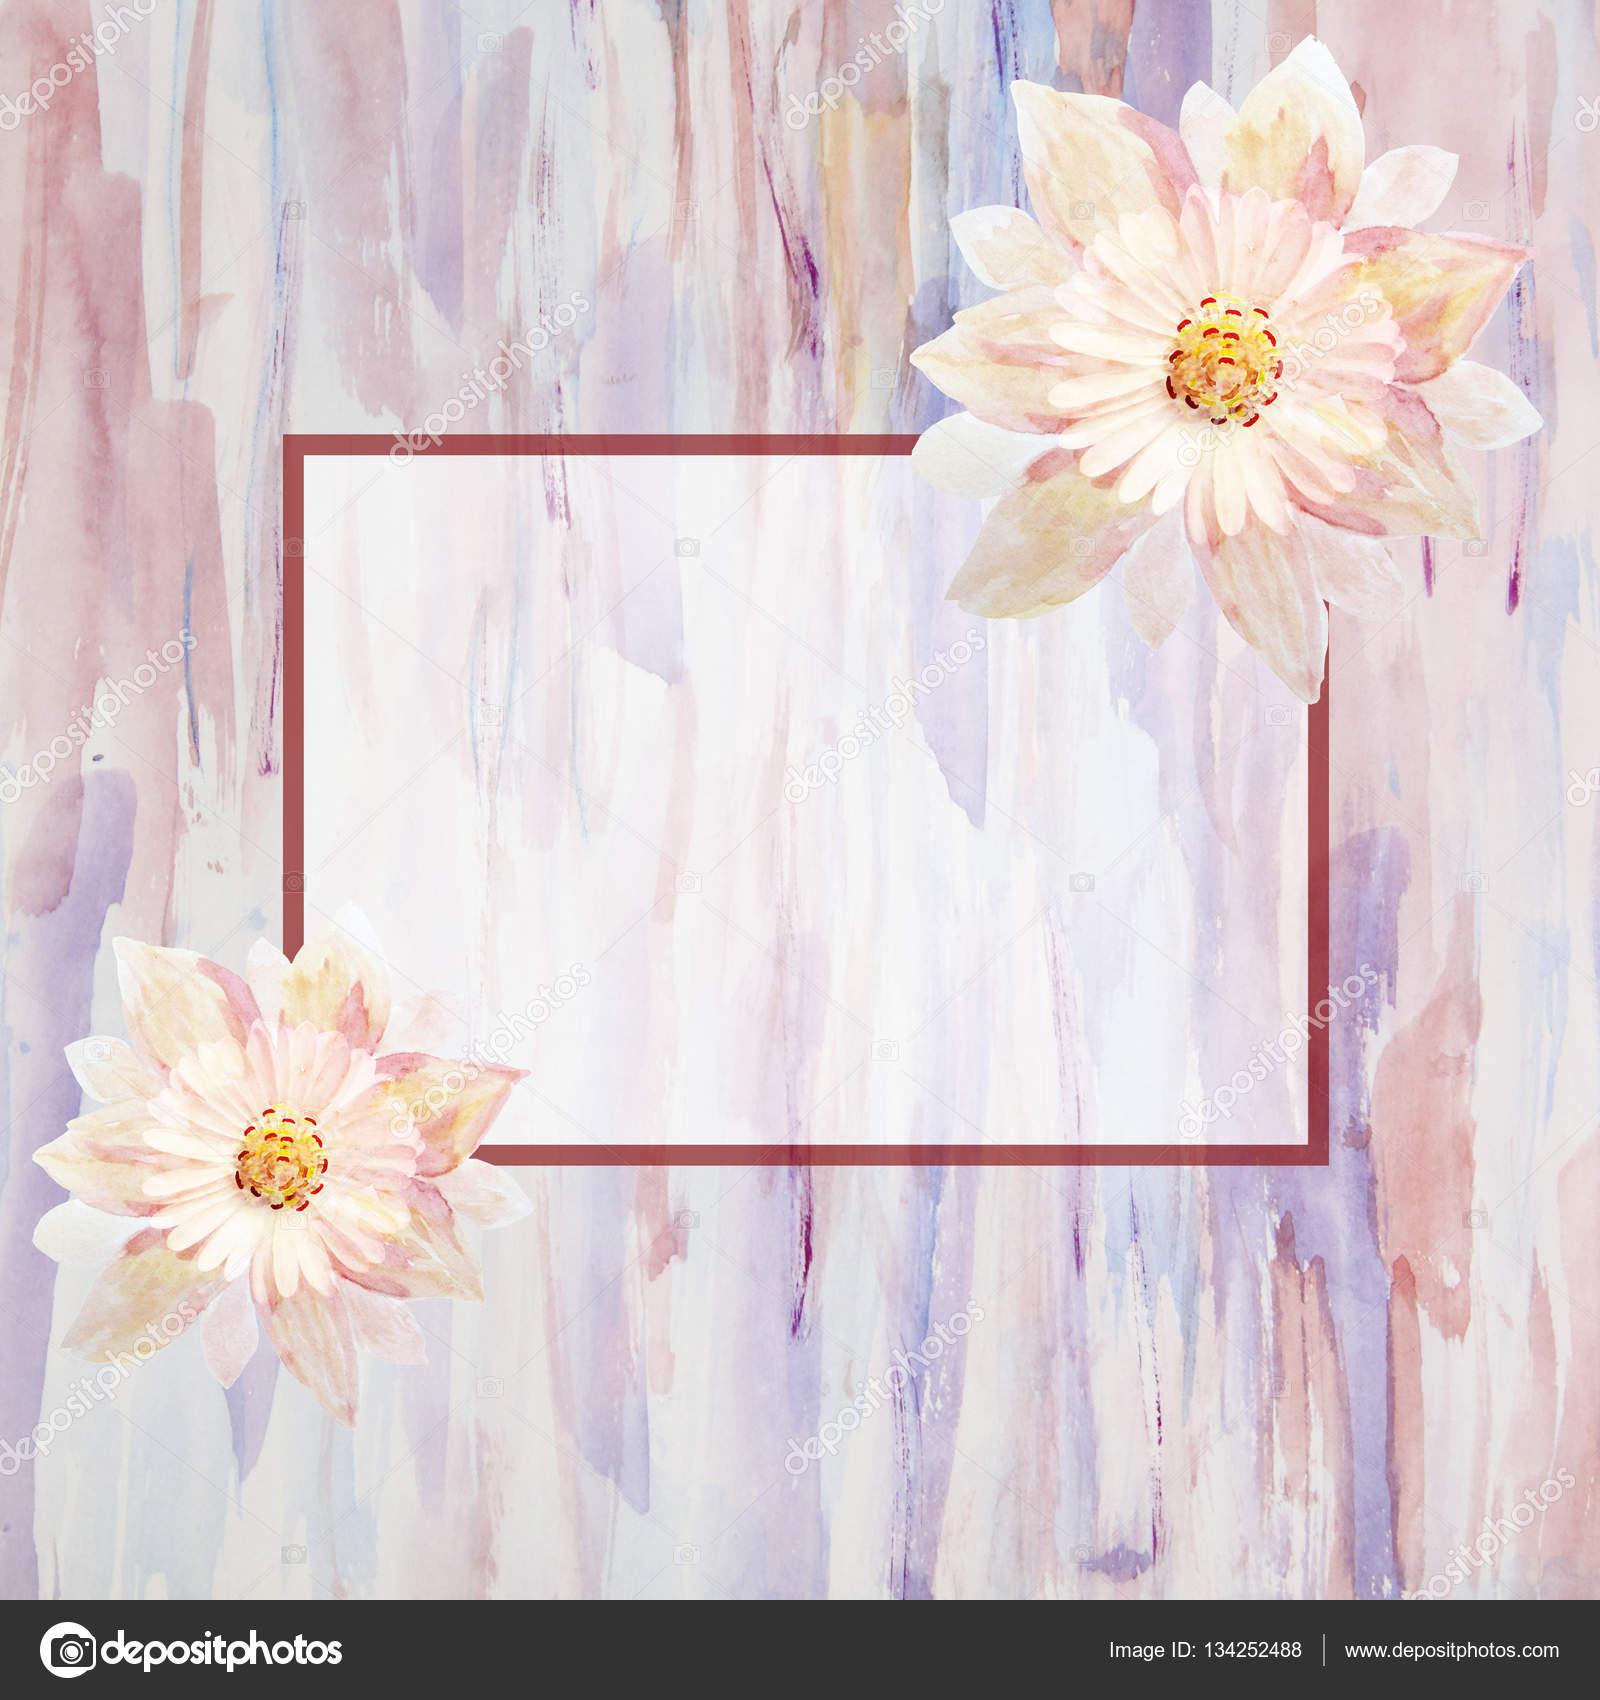 Greeting Card With Flowers Handmade Watercolor Painting Weddi